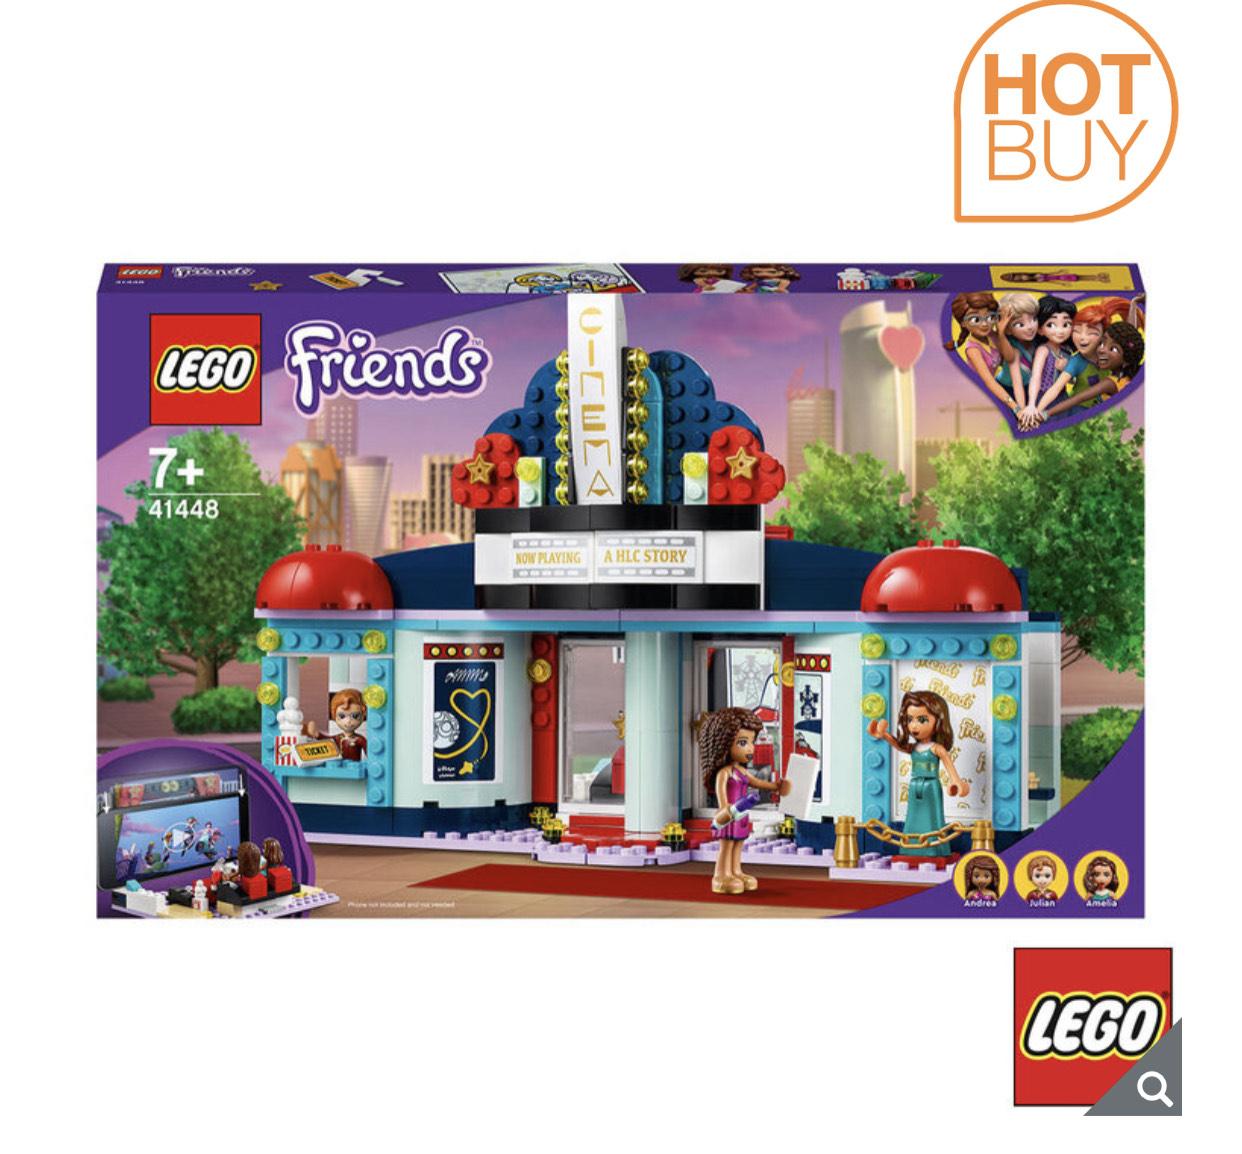 LEGO Friends Heartlake City Movie Theatre - Model 41448 £22.89 (Membership Required) @ Costco